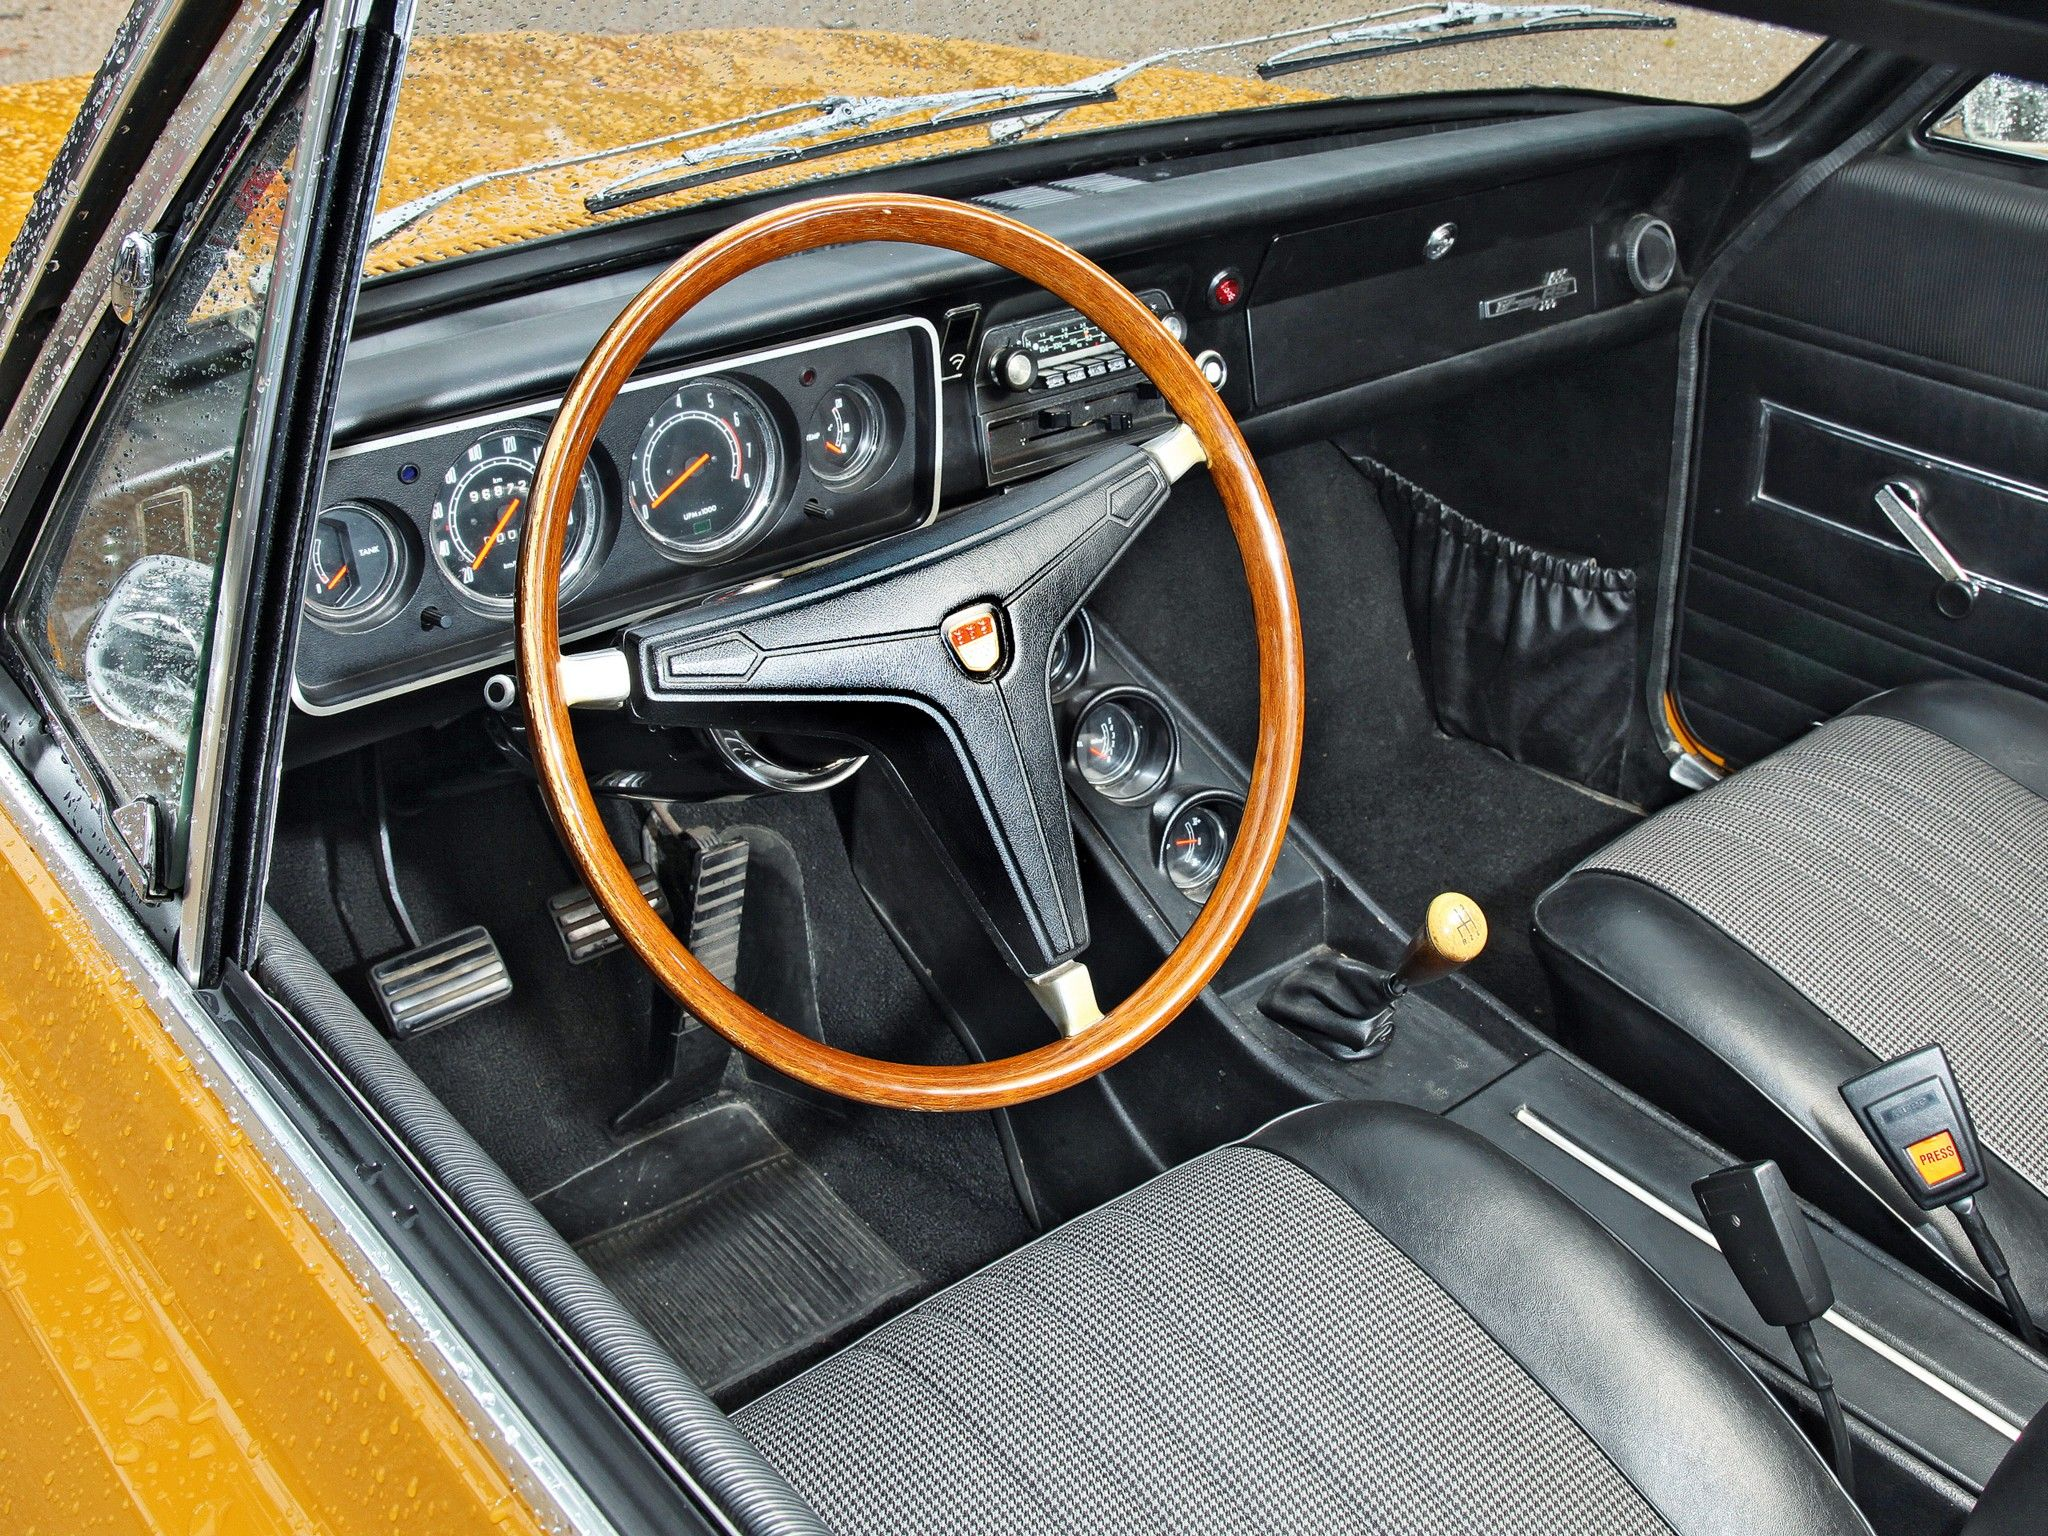 Ford Taunus 17m Rs Hardtop 3 Jpg 2048 1536 Oldtimer